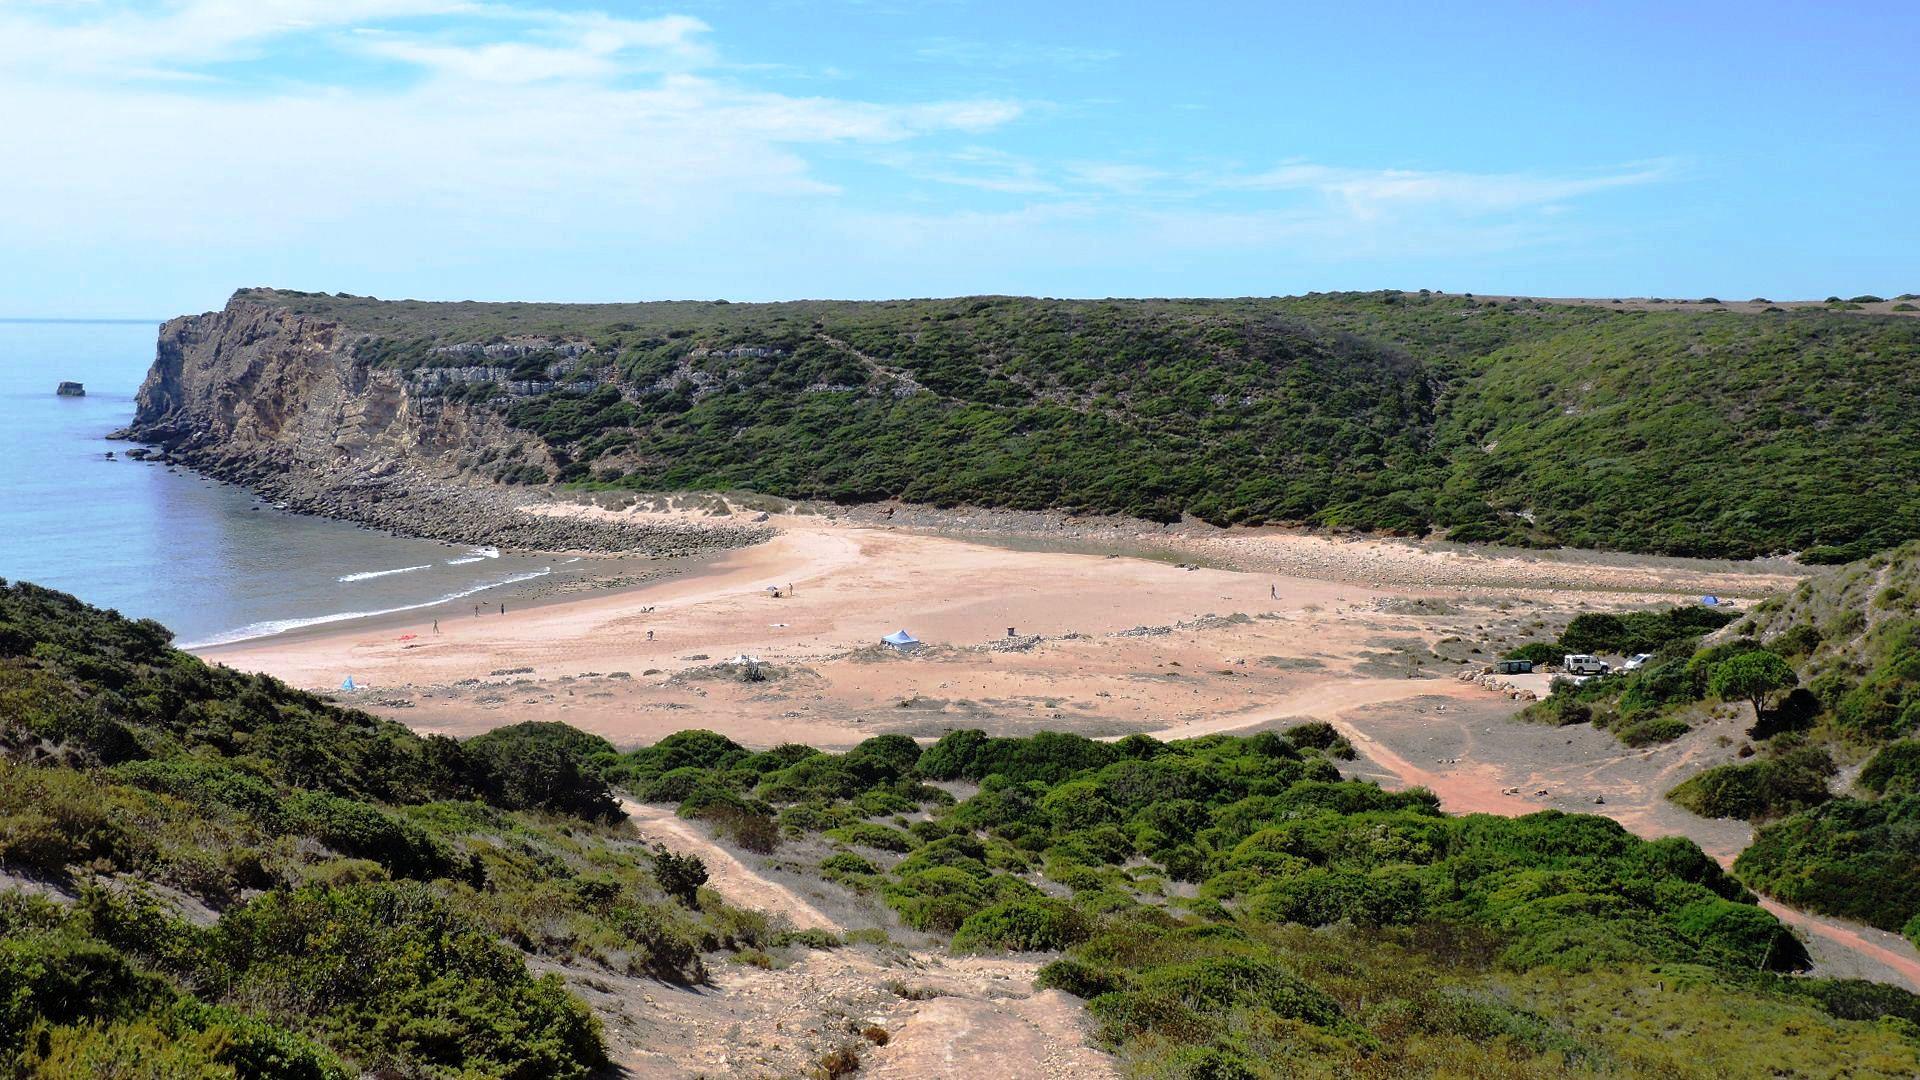 Rapoeira à praia do Zavial